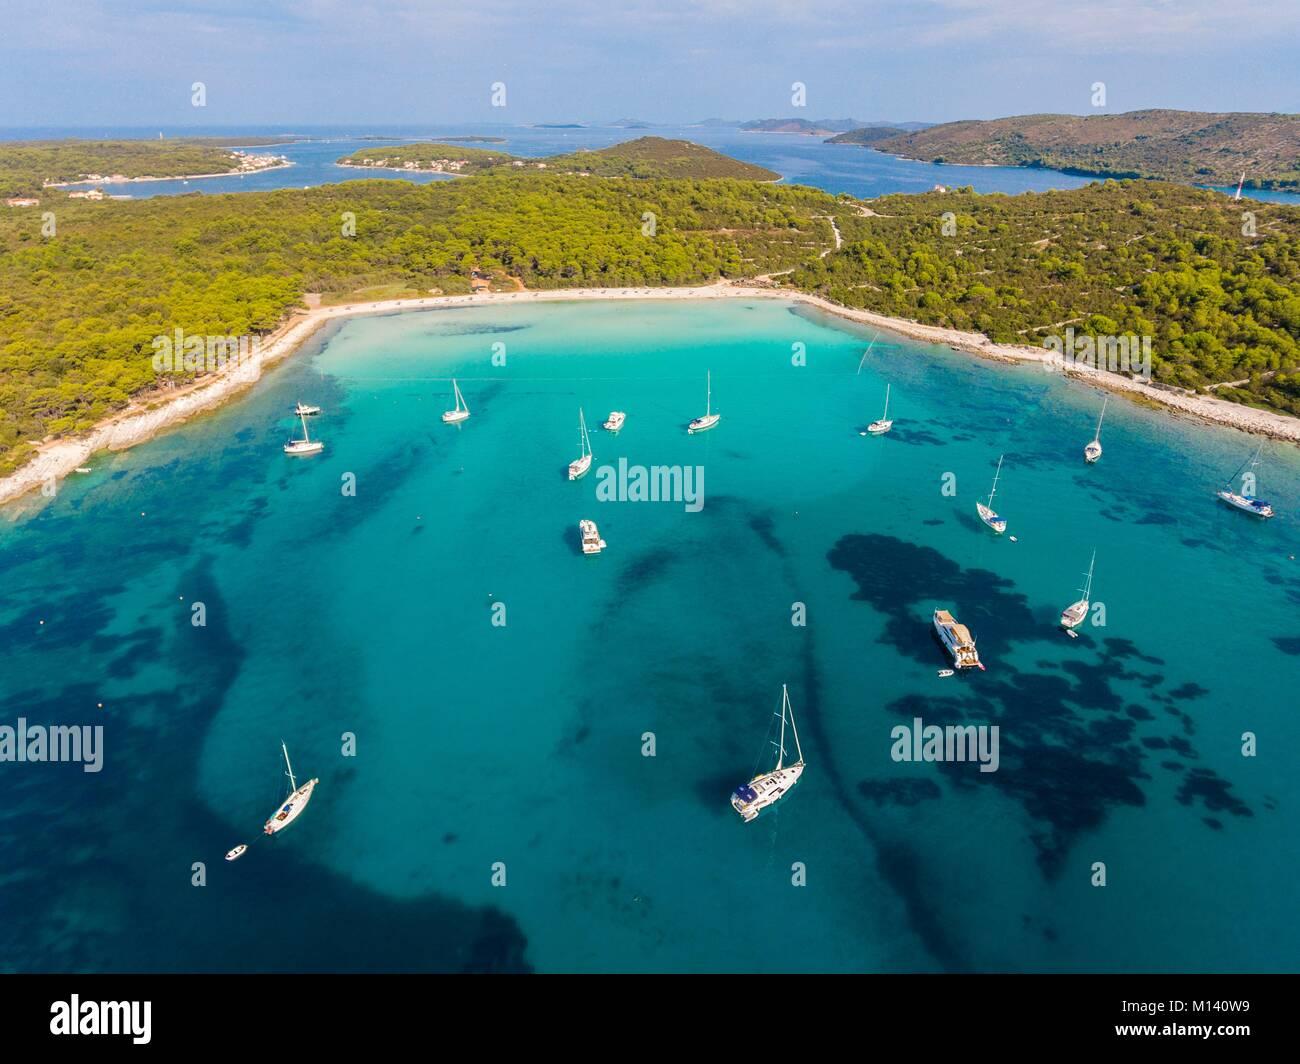 Kroatien, Dalmatien, Dalmatinischen Küste, Zadar, Insel Dugi Otok, Sakarun Strand (Luftbild) Stockbild